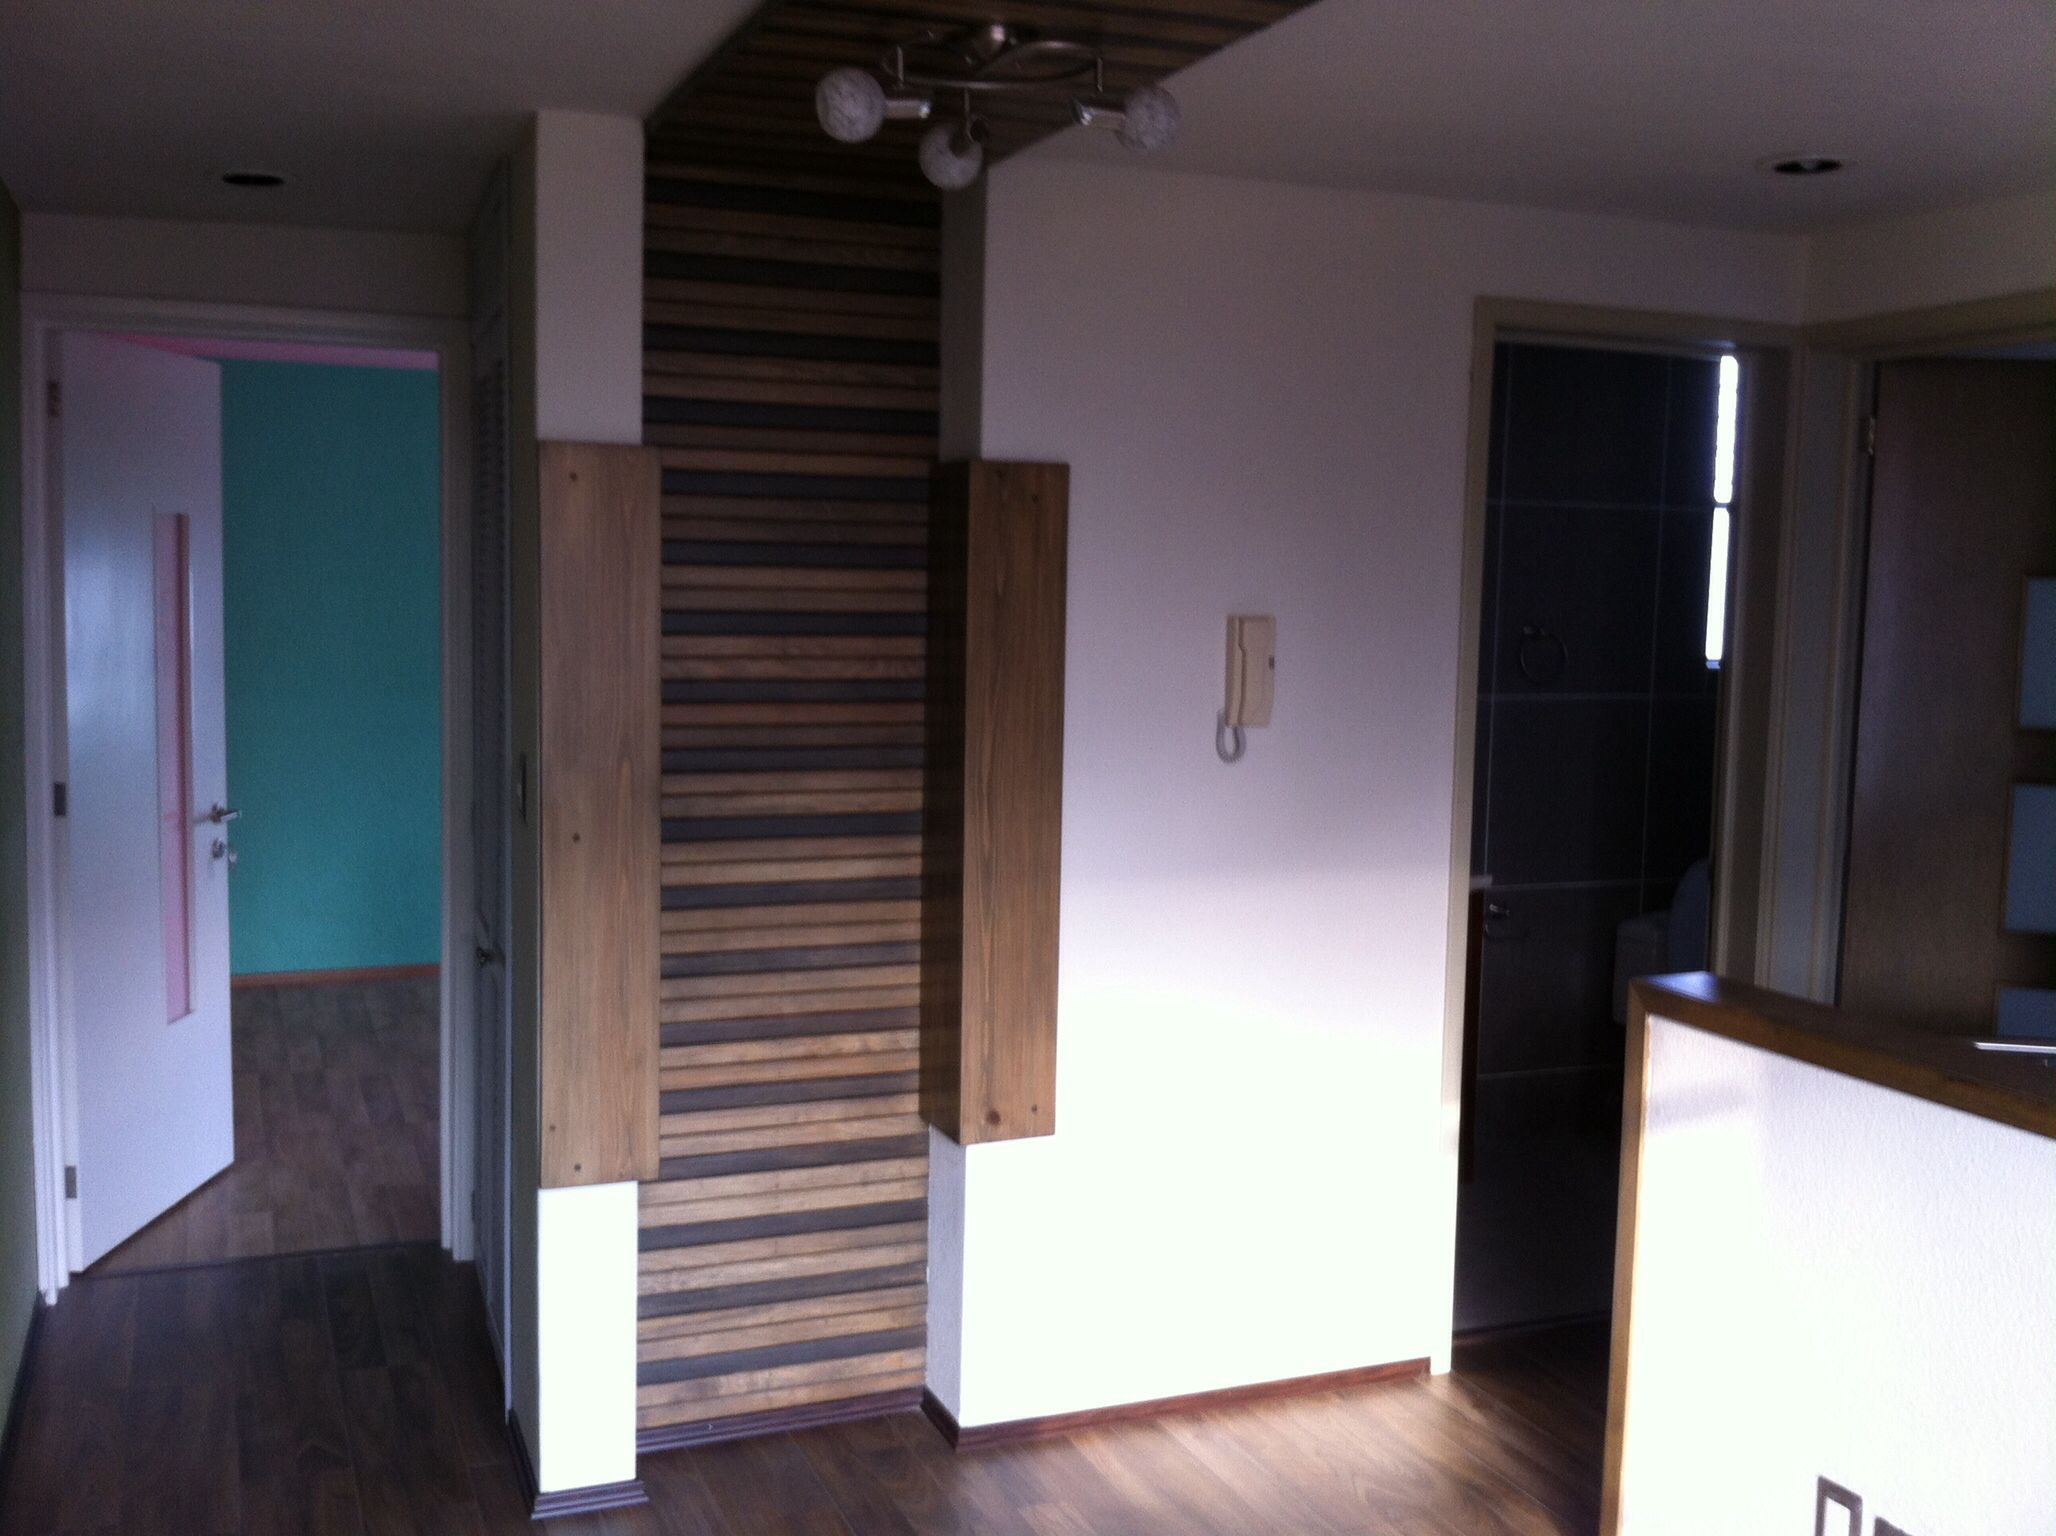 Duela de madera muro a techo elearq pinterest duela - Duelas de madera ...